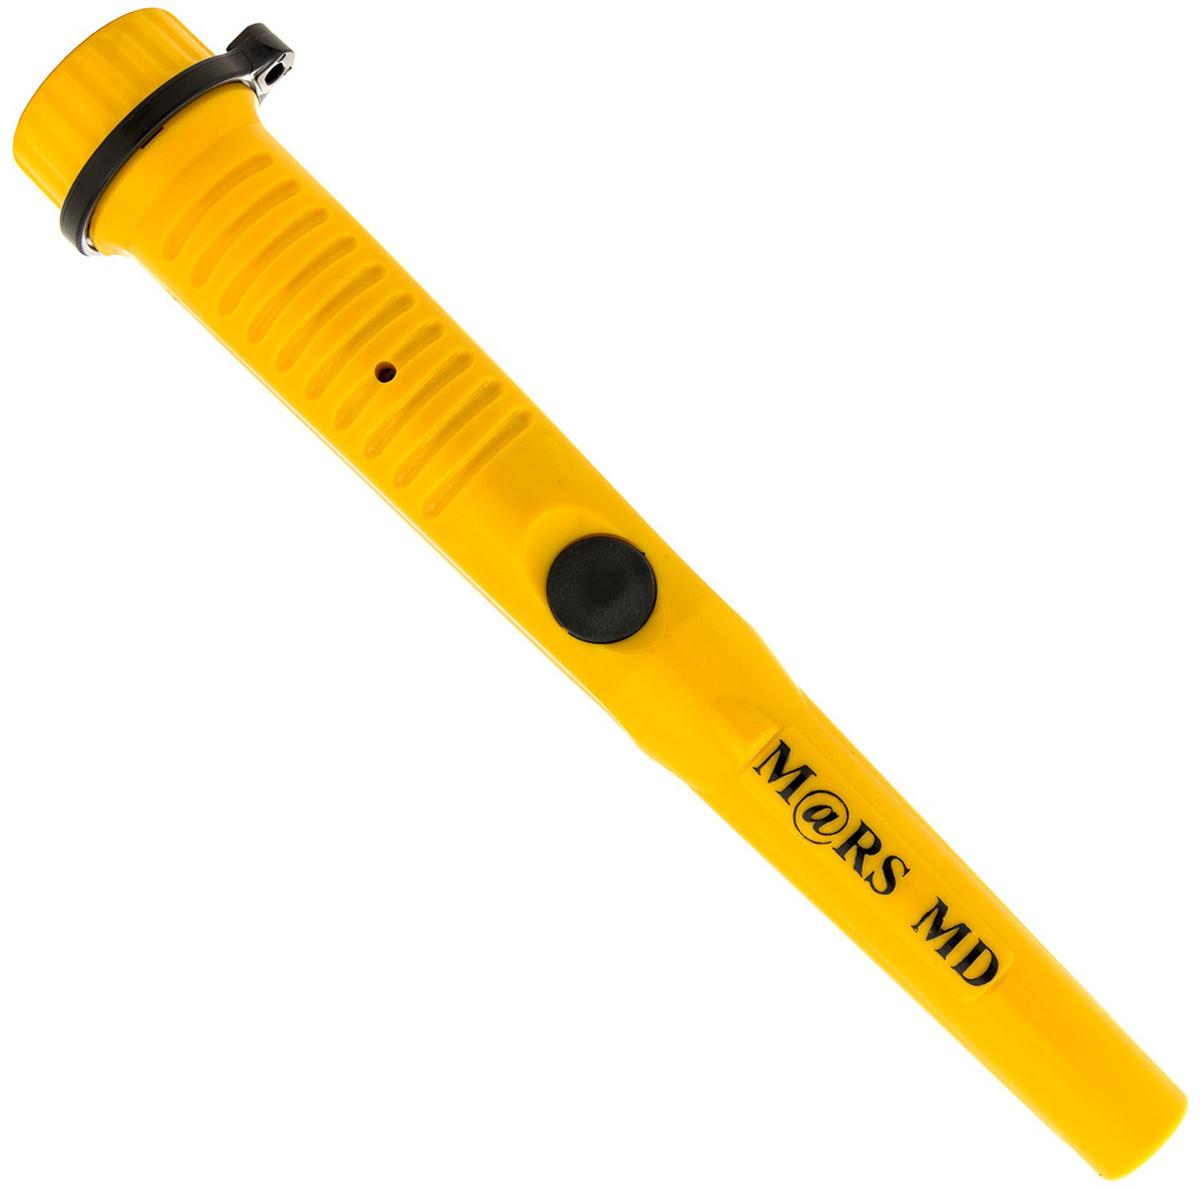 "Металлоискатель Mars ""MD Pin Pointer Yellow"", цвет: желтый, черный, длина 25,5 см"